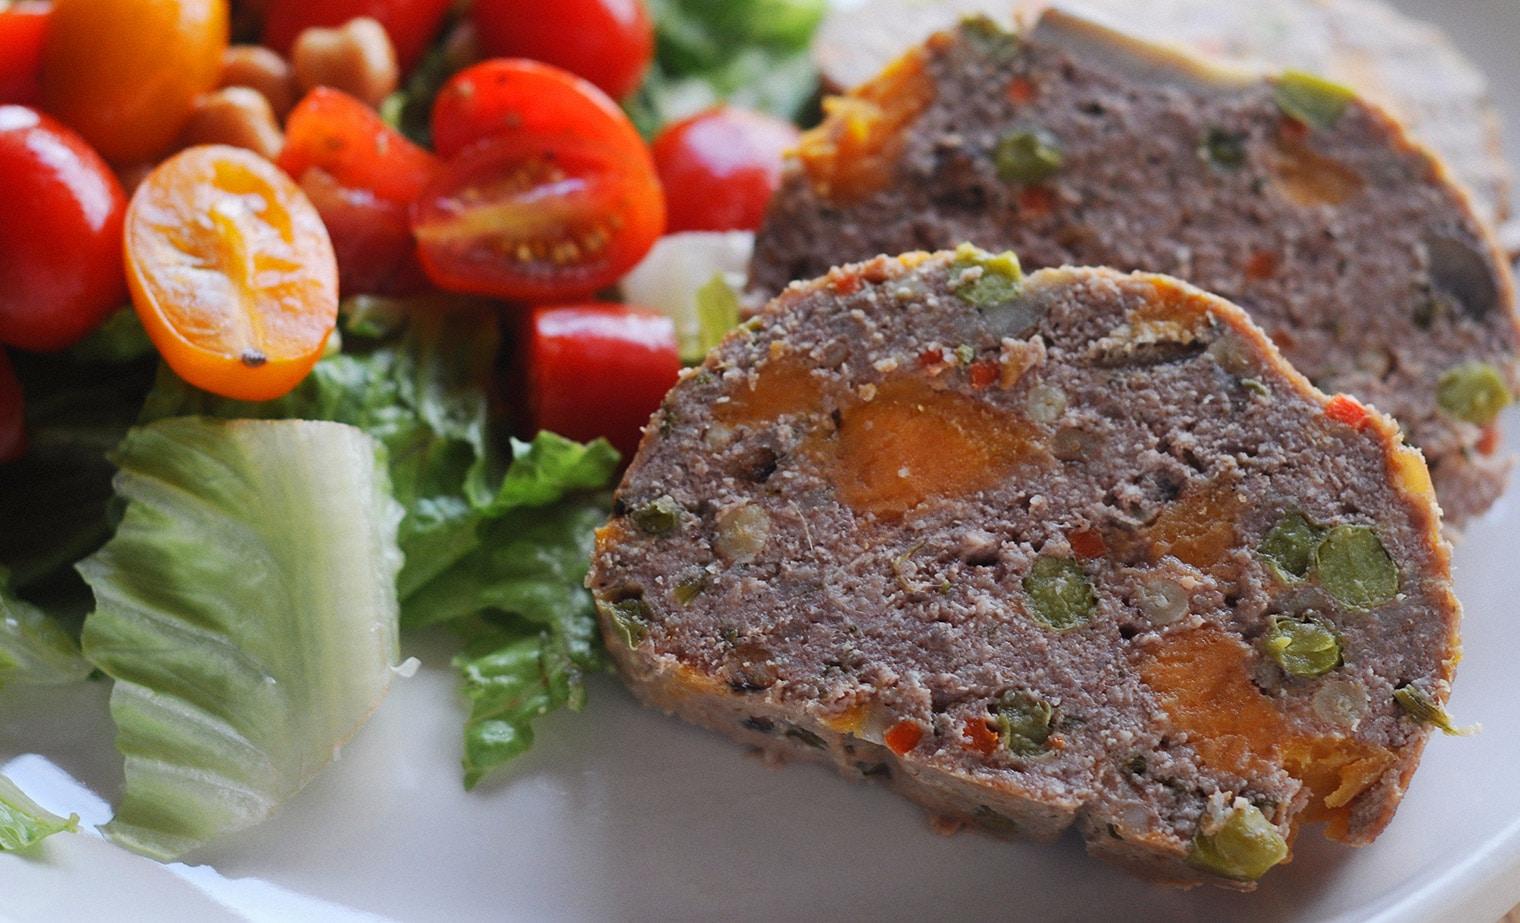 French meatloaf gateau de viande lizzy loves food for Viande cuisinee